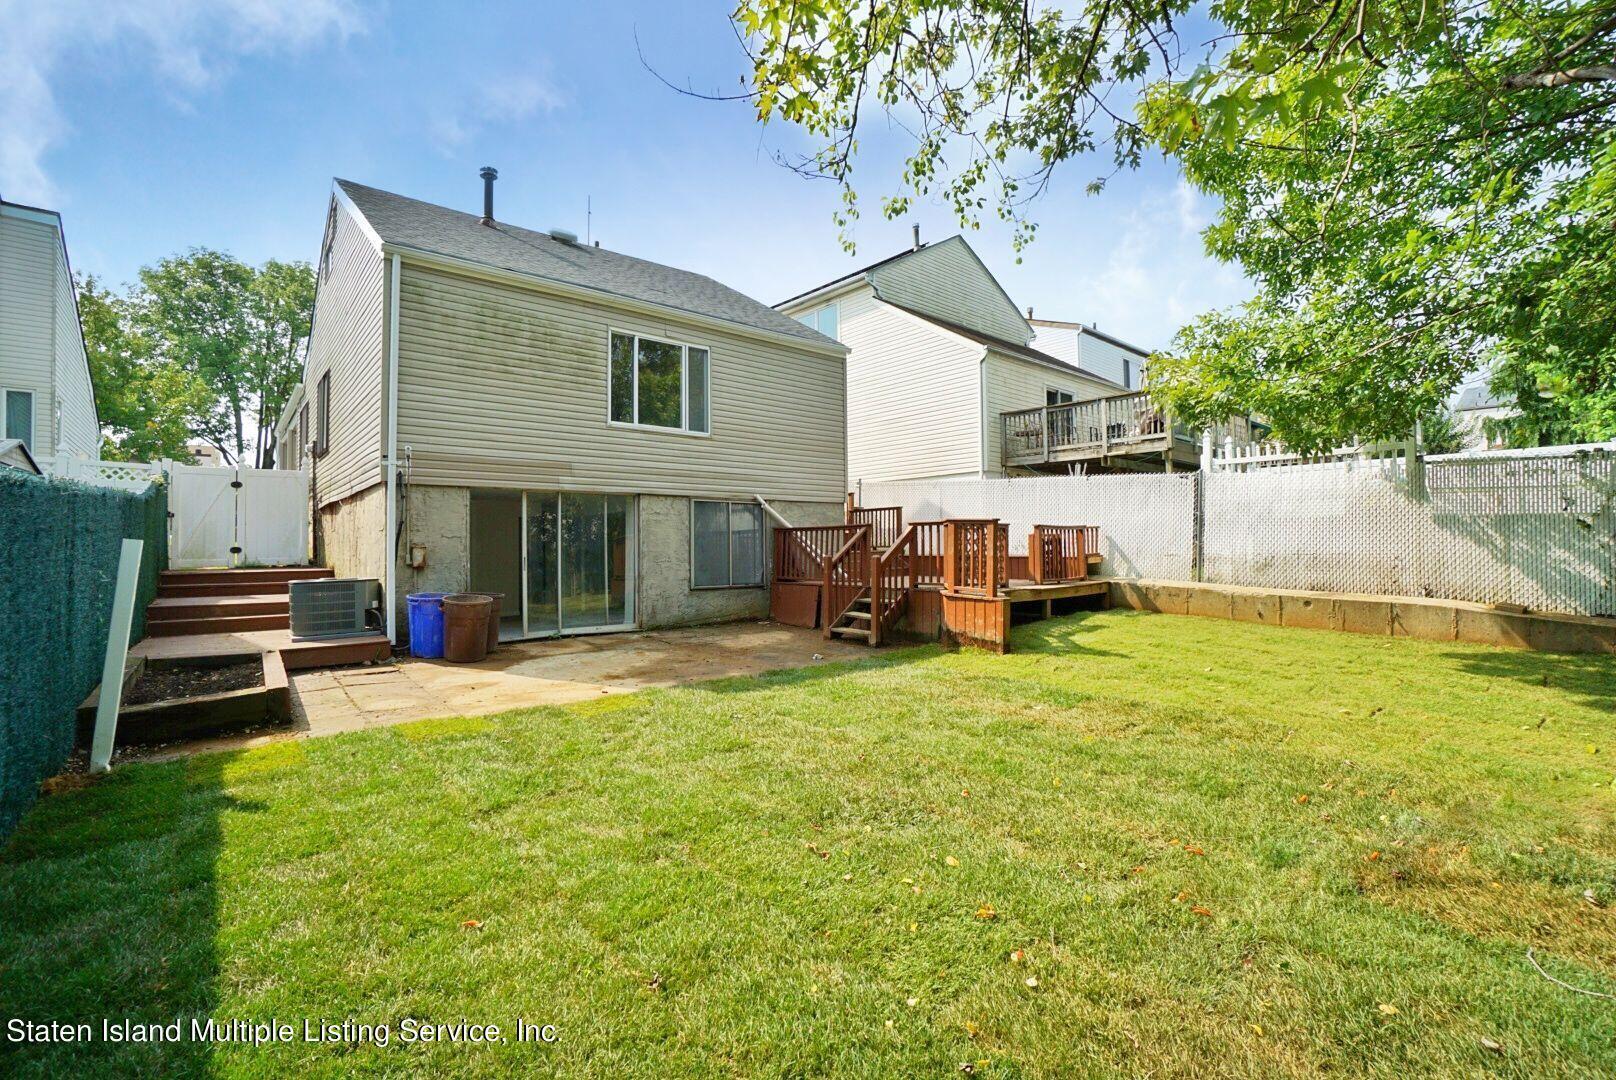 Single Family - Detached 83 Boylan Street  Staten Island, NY 10312, MLS-1149266-26